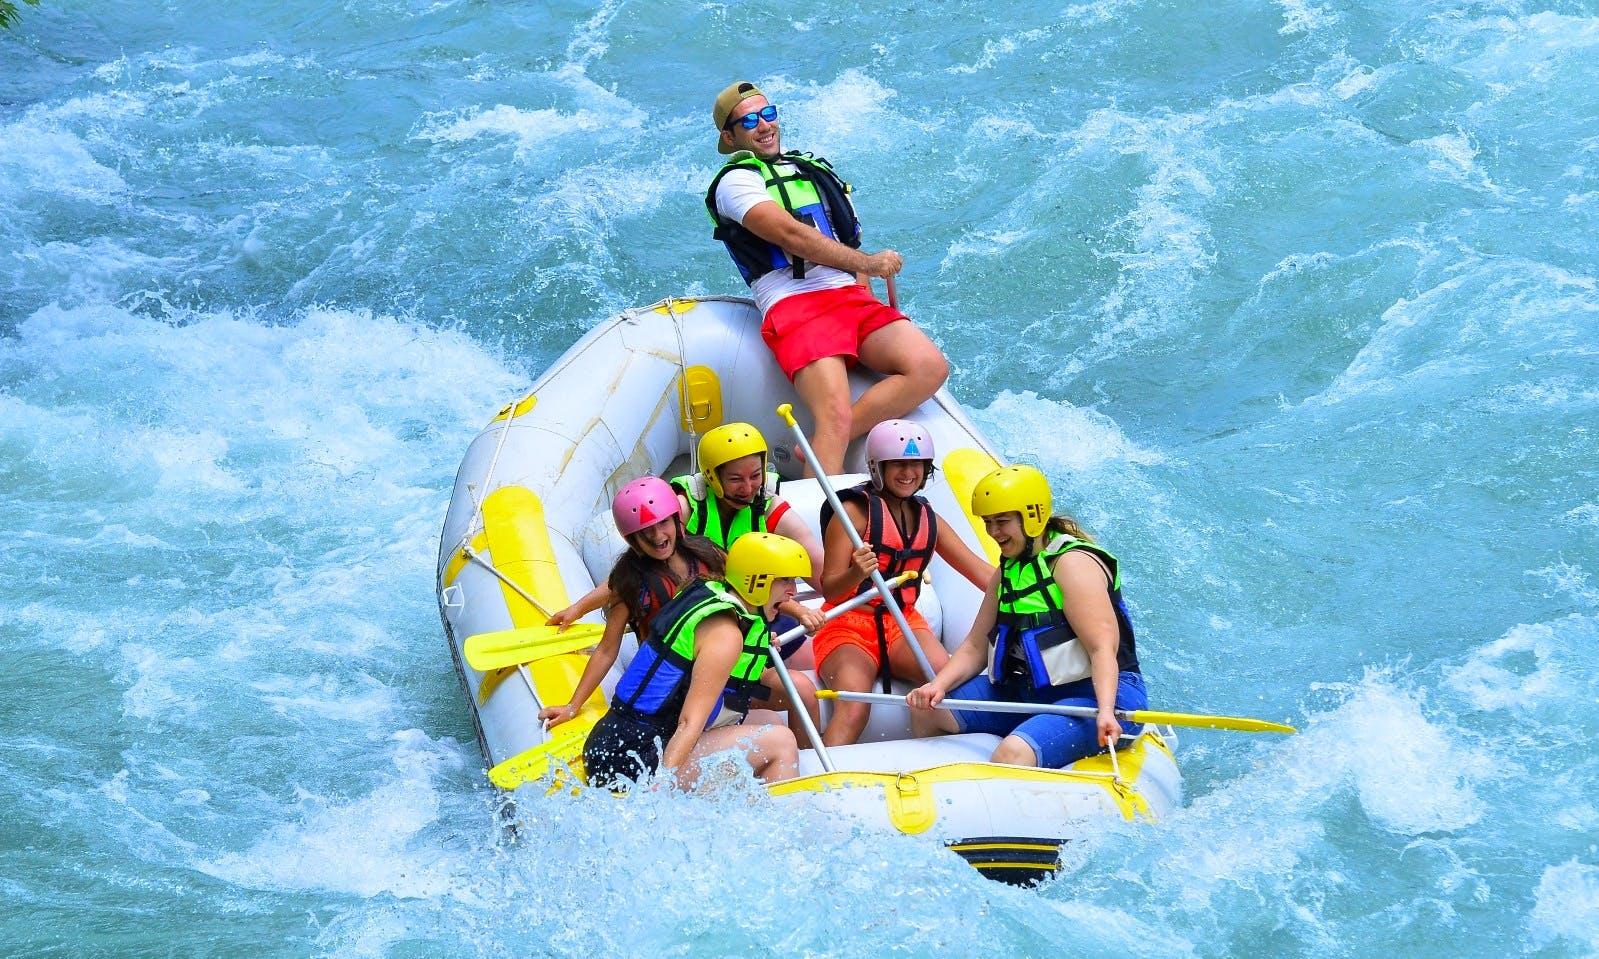 Experience The Thrill Of Rafting in Antalya, Turkey